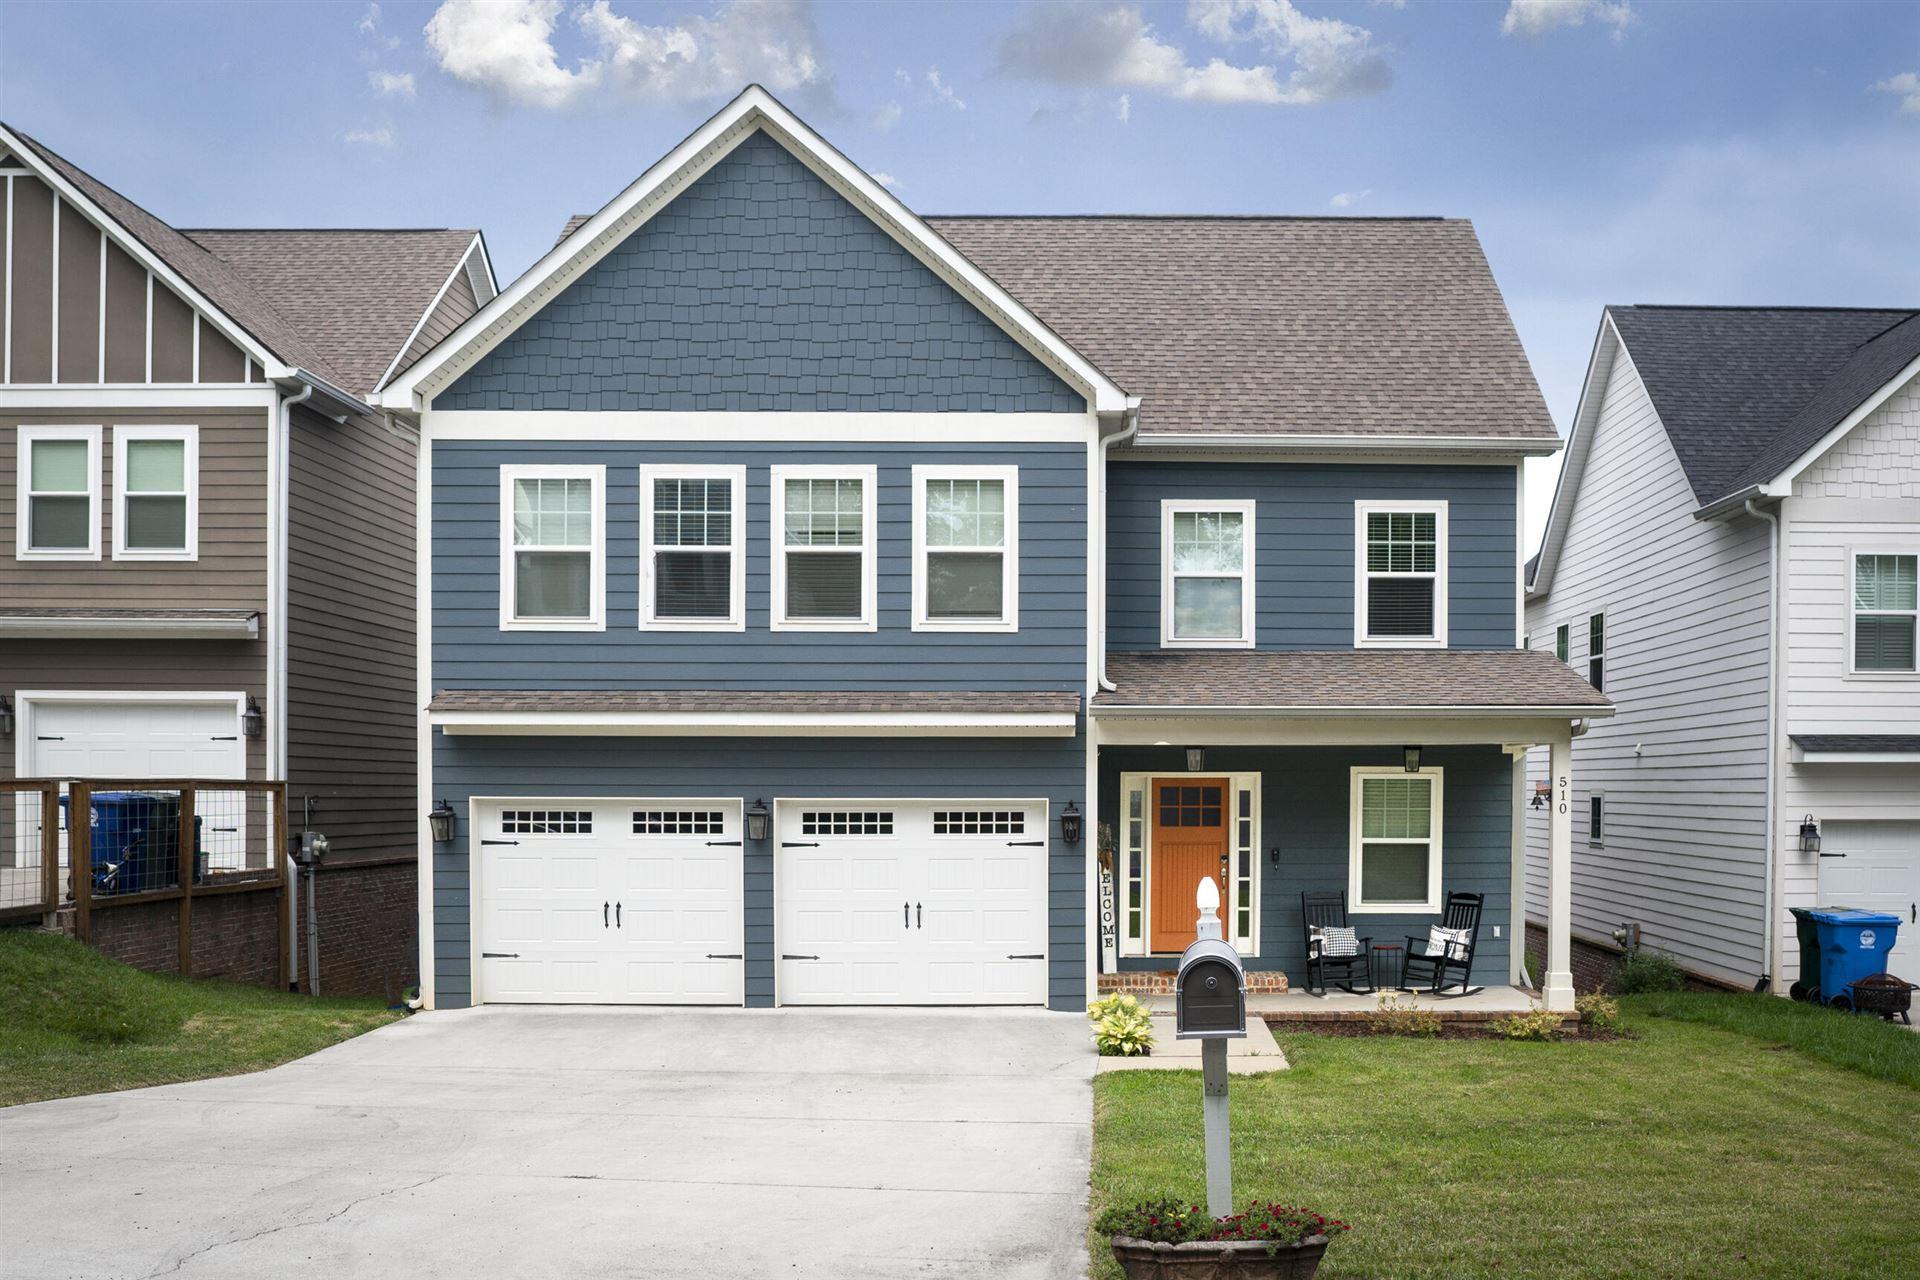 510 Rosewood St, Chattanooga, TN 37405 - MLS#: 1338879